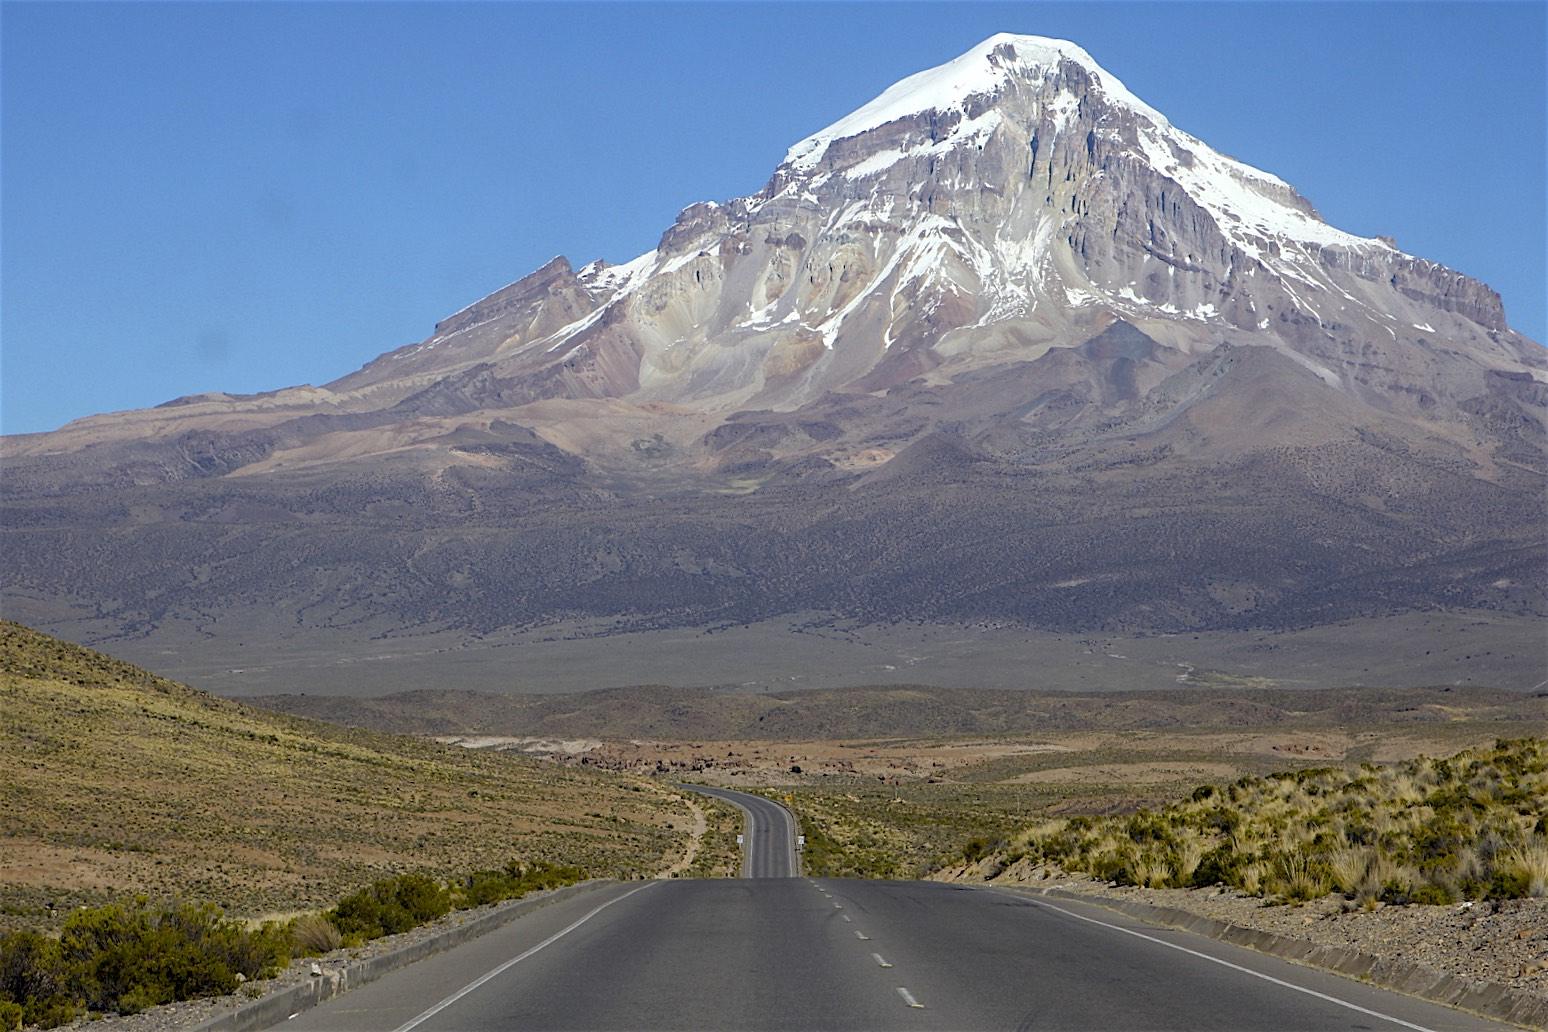 Volcan Sajama 6,520m